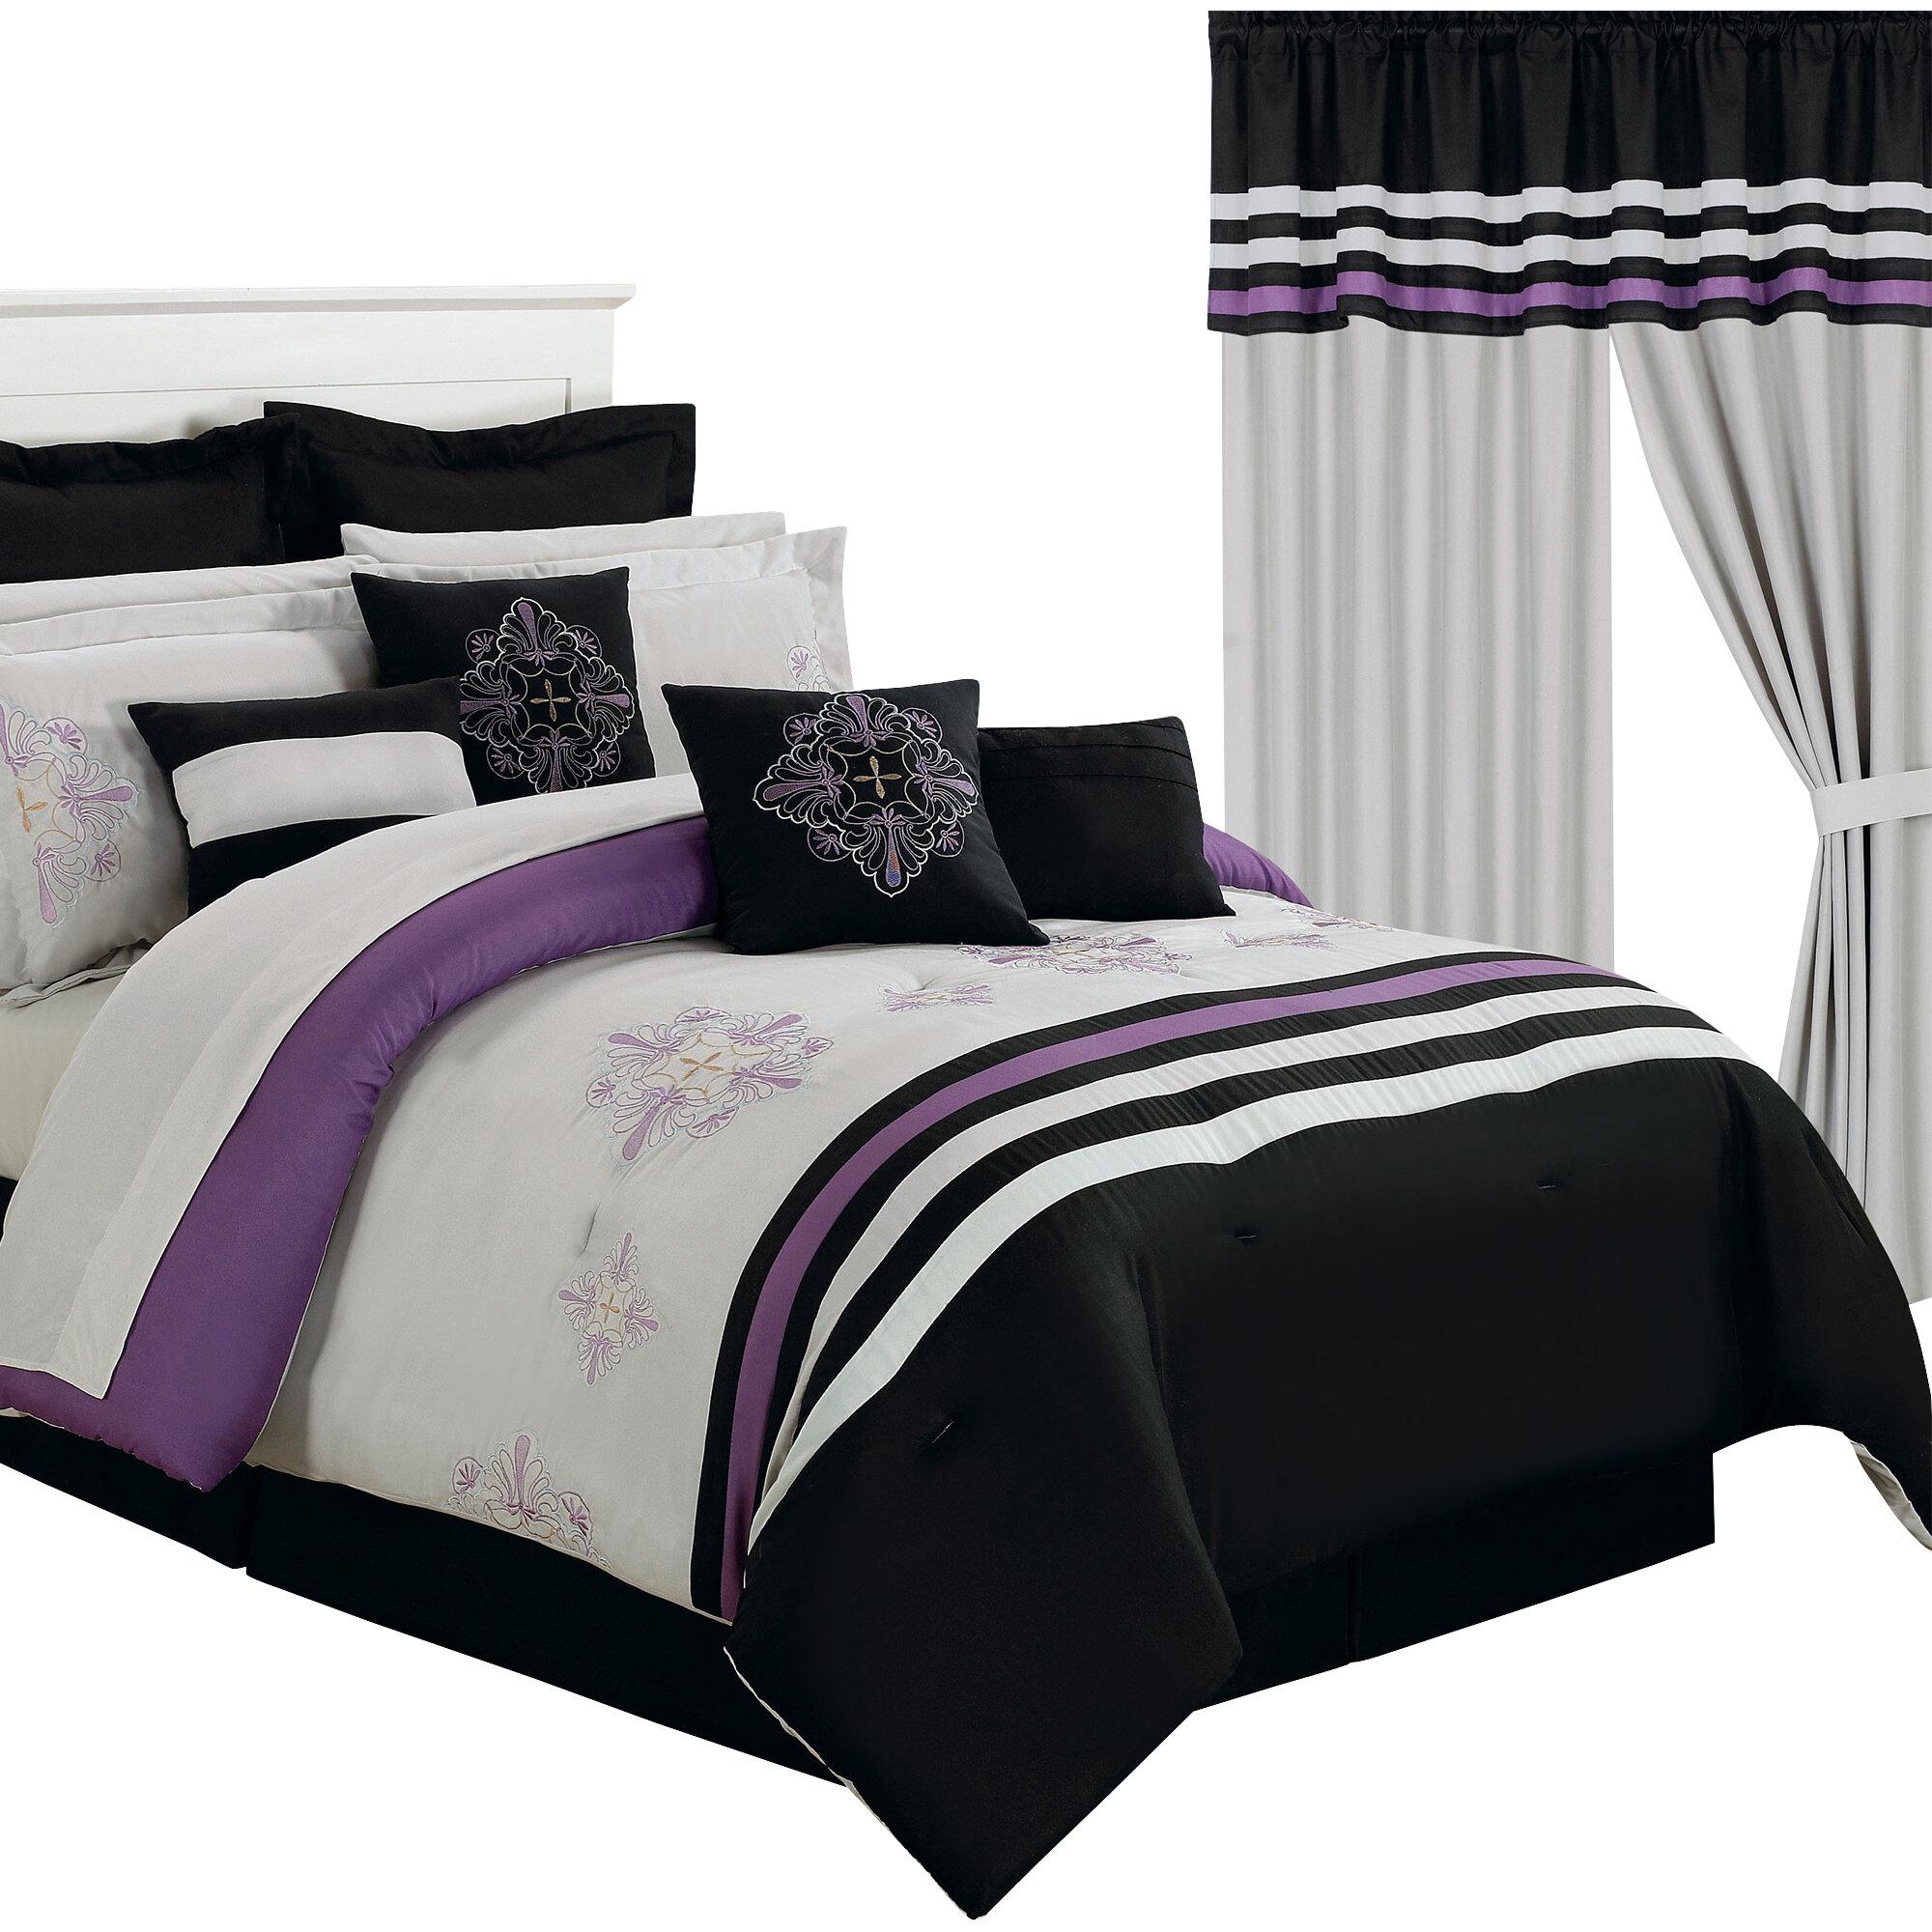 Lavish Home Rachel 24 Piece Bed-In-A-Bag Set & Reviews   Wayfair